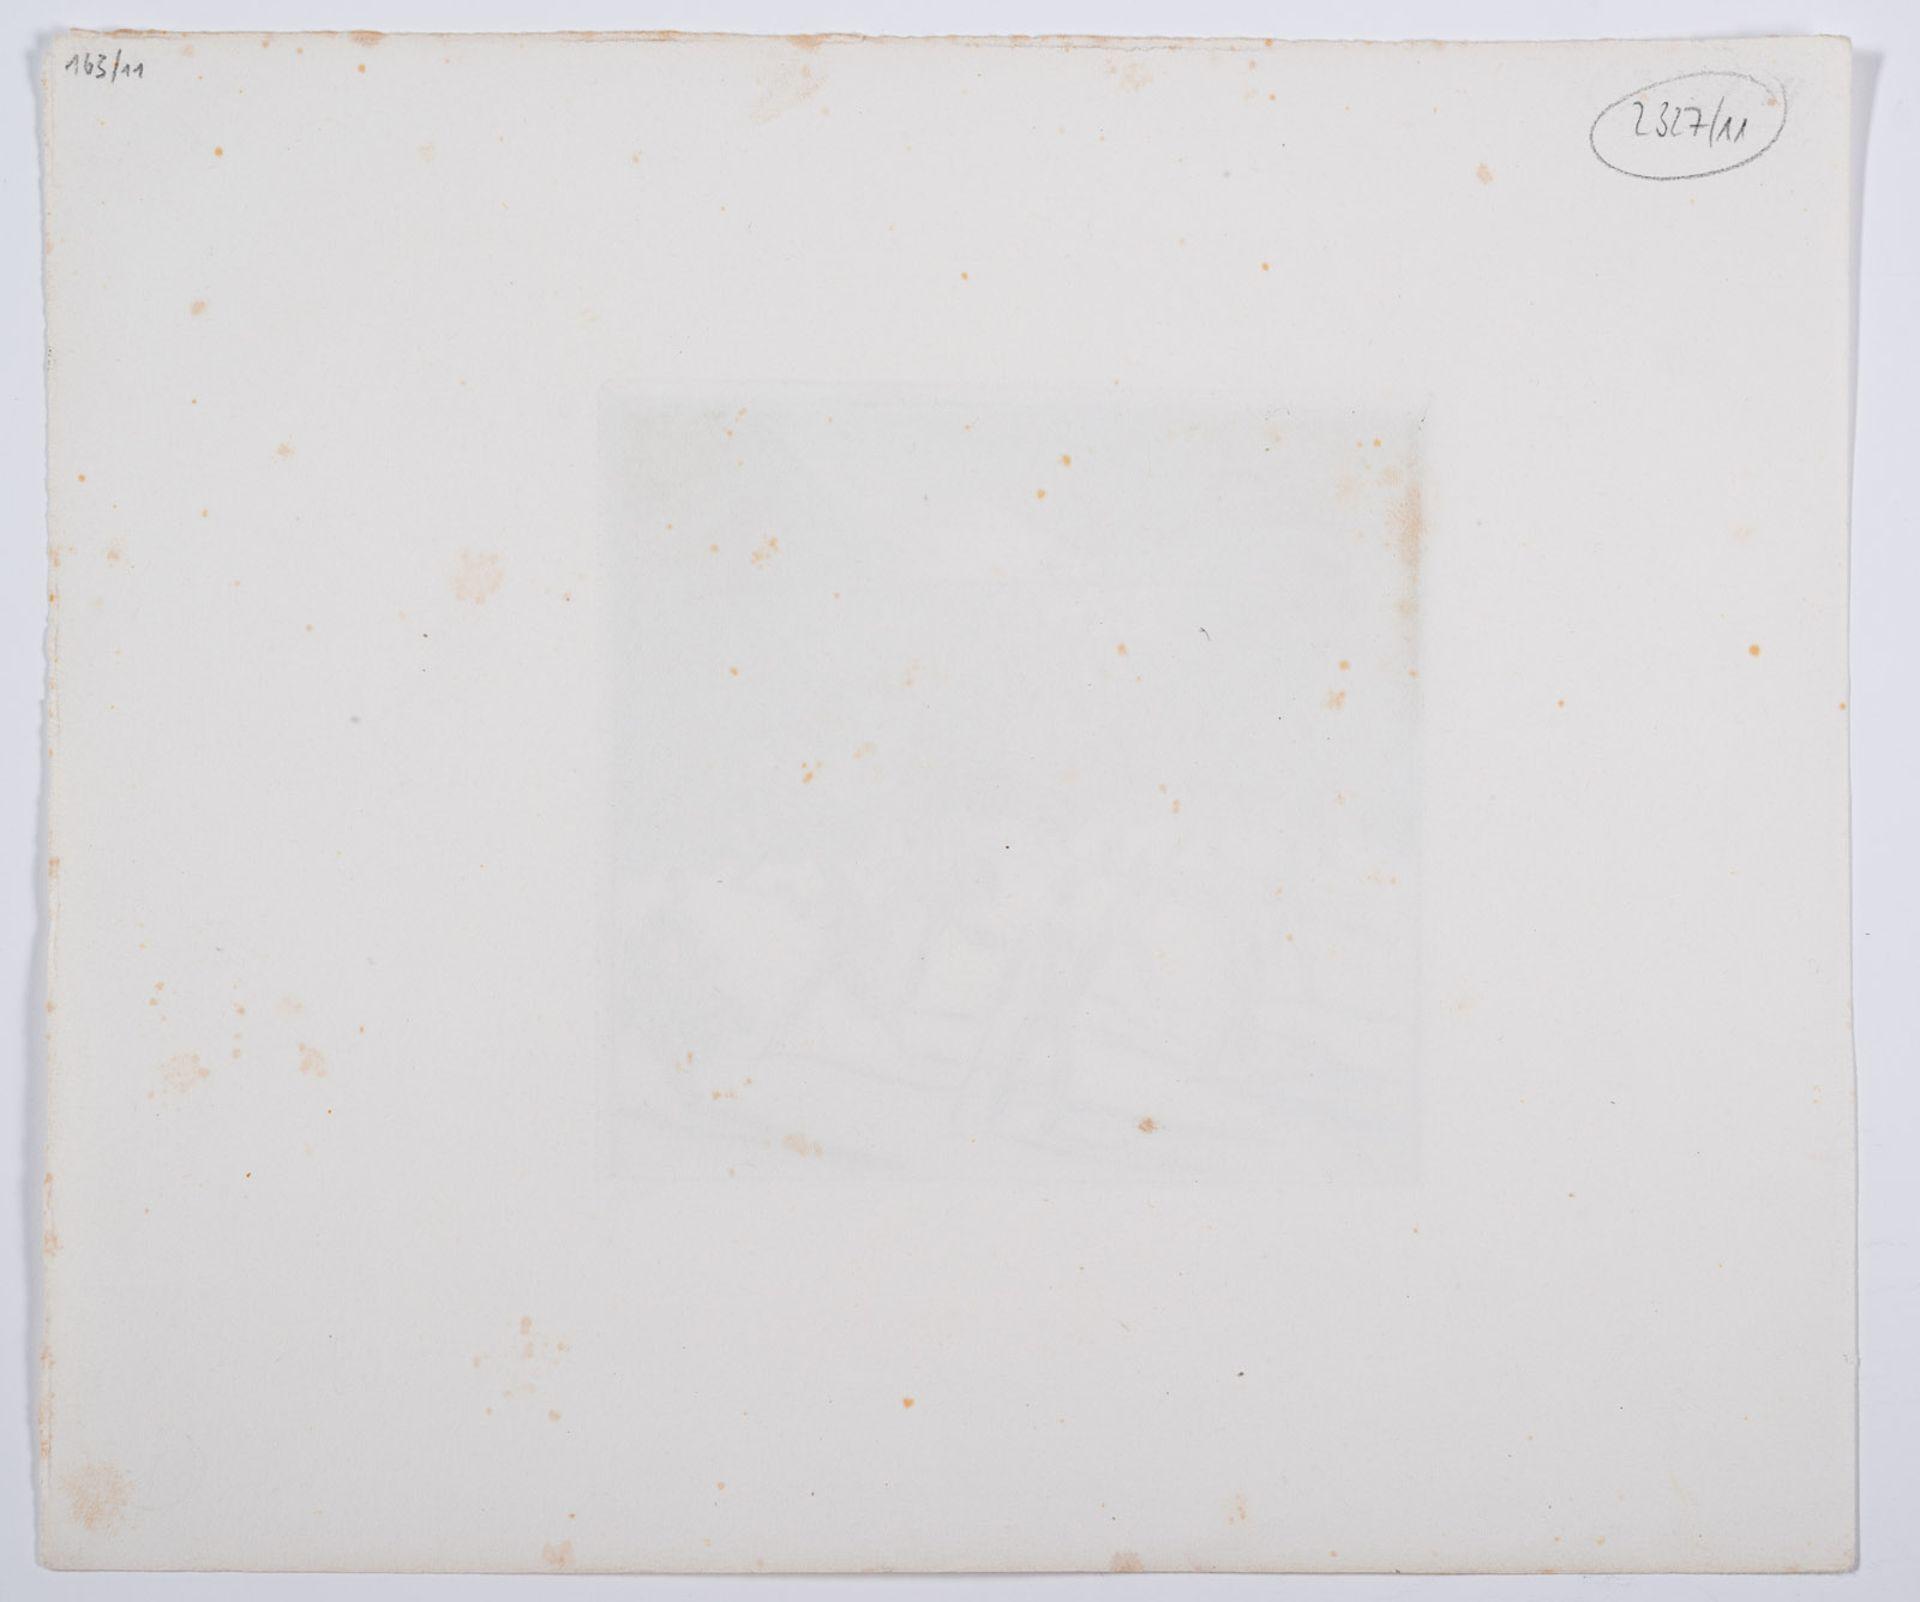 Geiger, Willi - Image 4 of 22